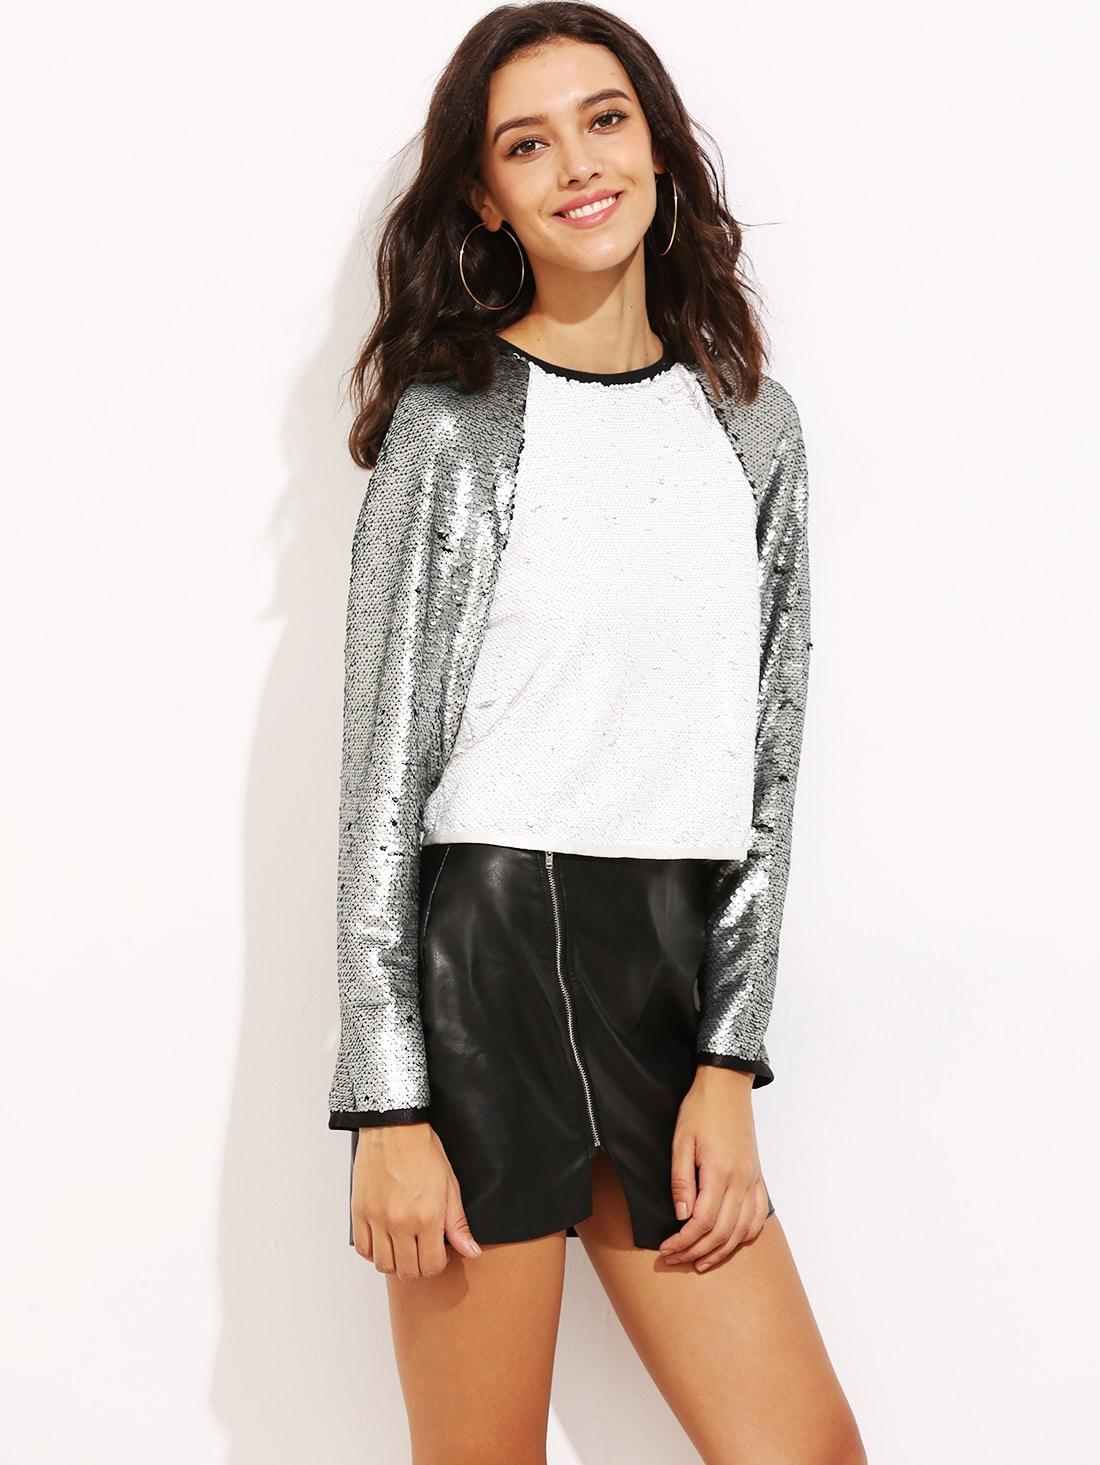 Contrast Raglan Sleeve Sequin T-shirt tee160909702